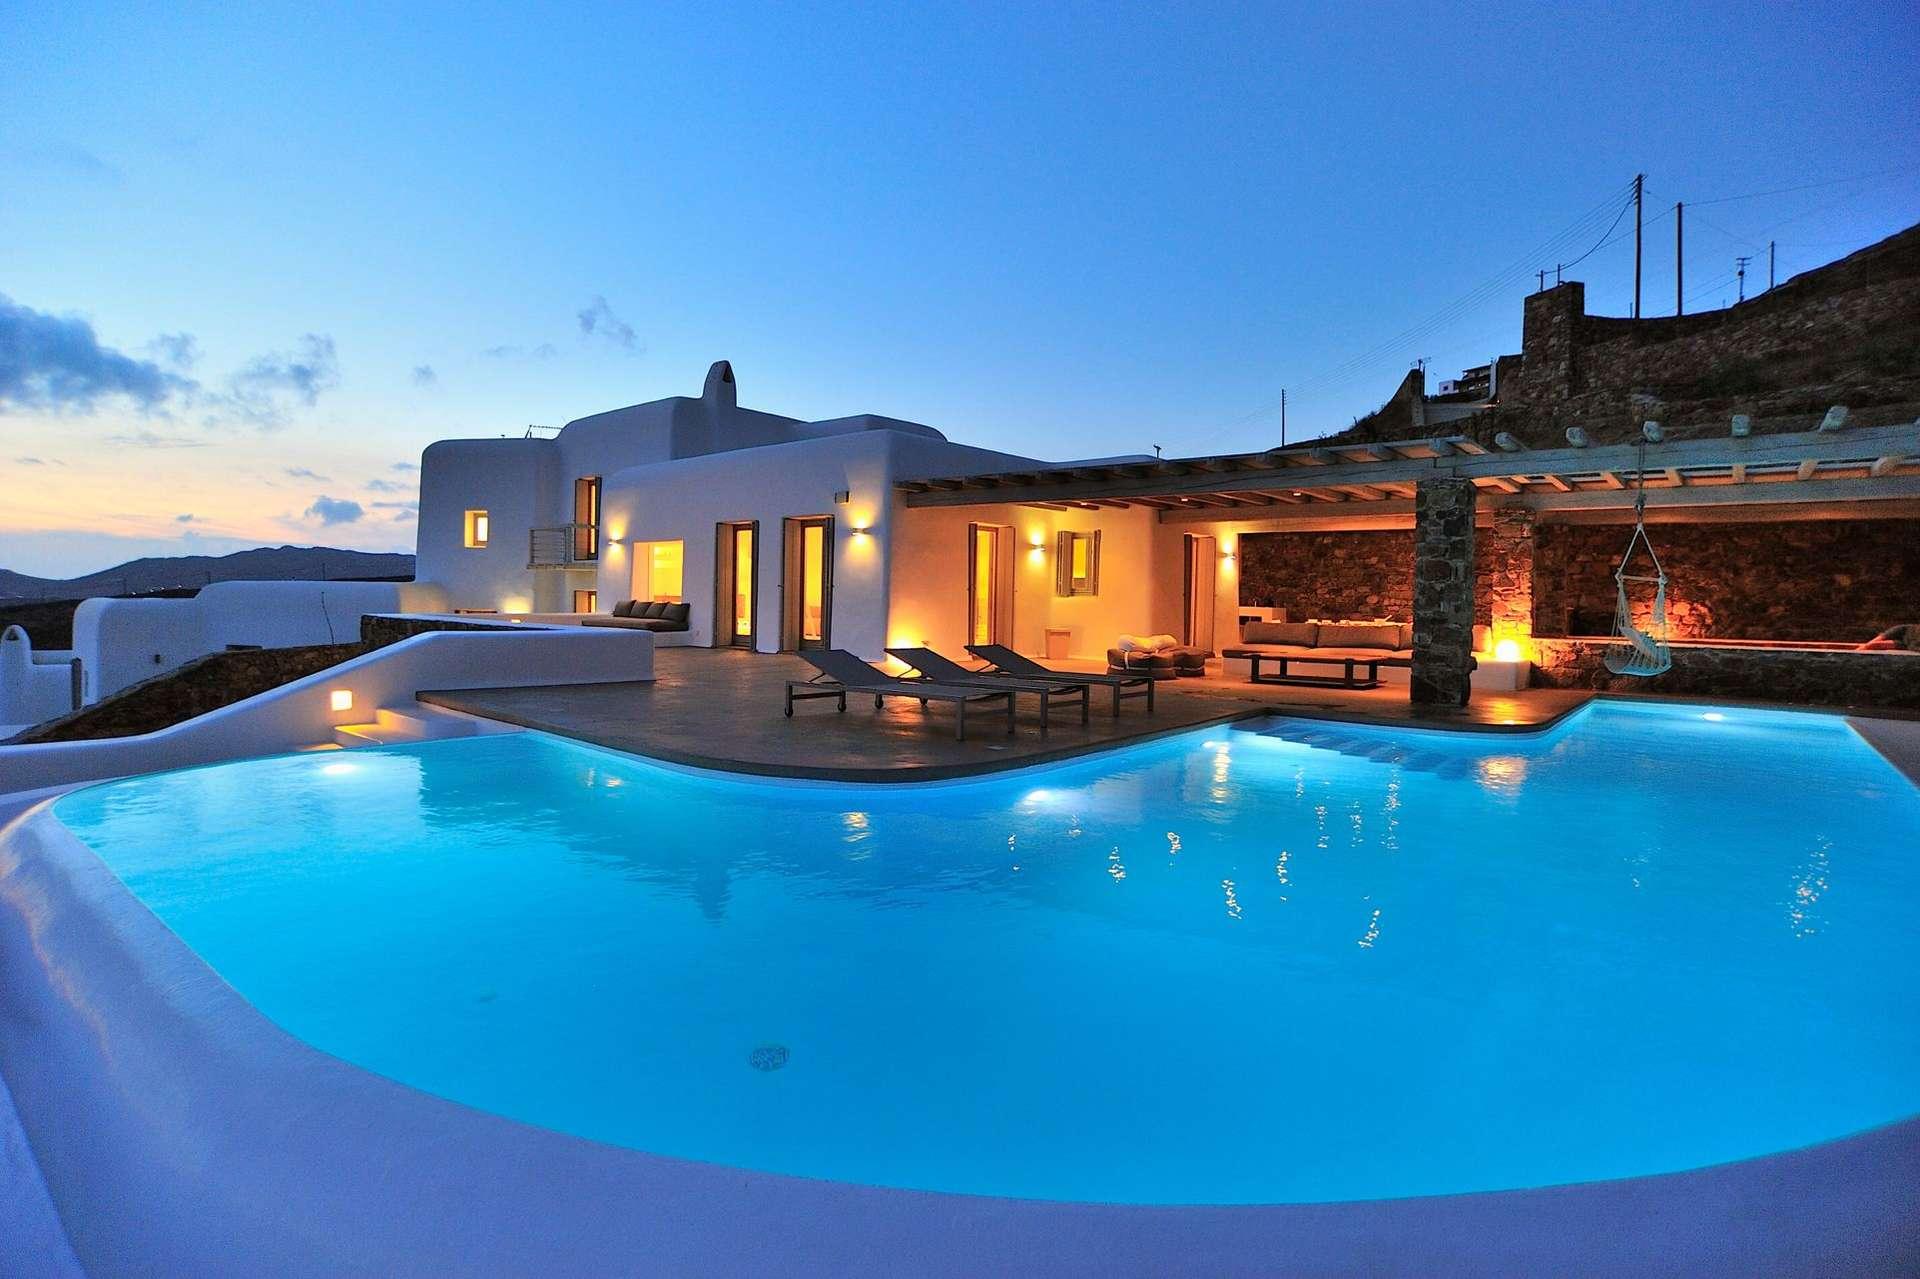 Luxury vacation rentals europe - Greece - Mykonos - Tigani - Atena - Image 1/14